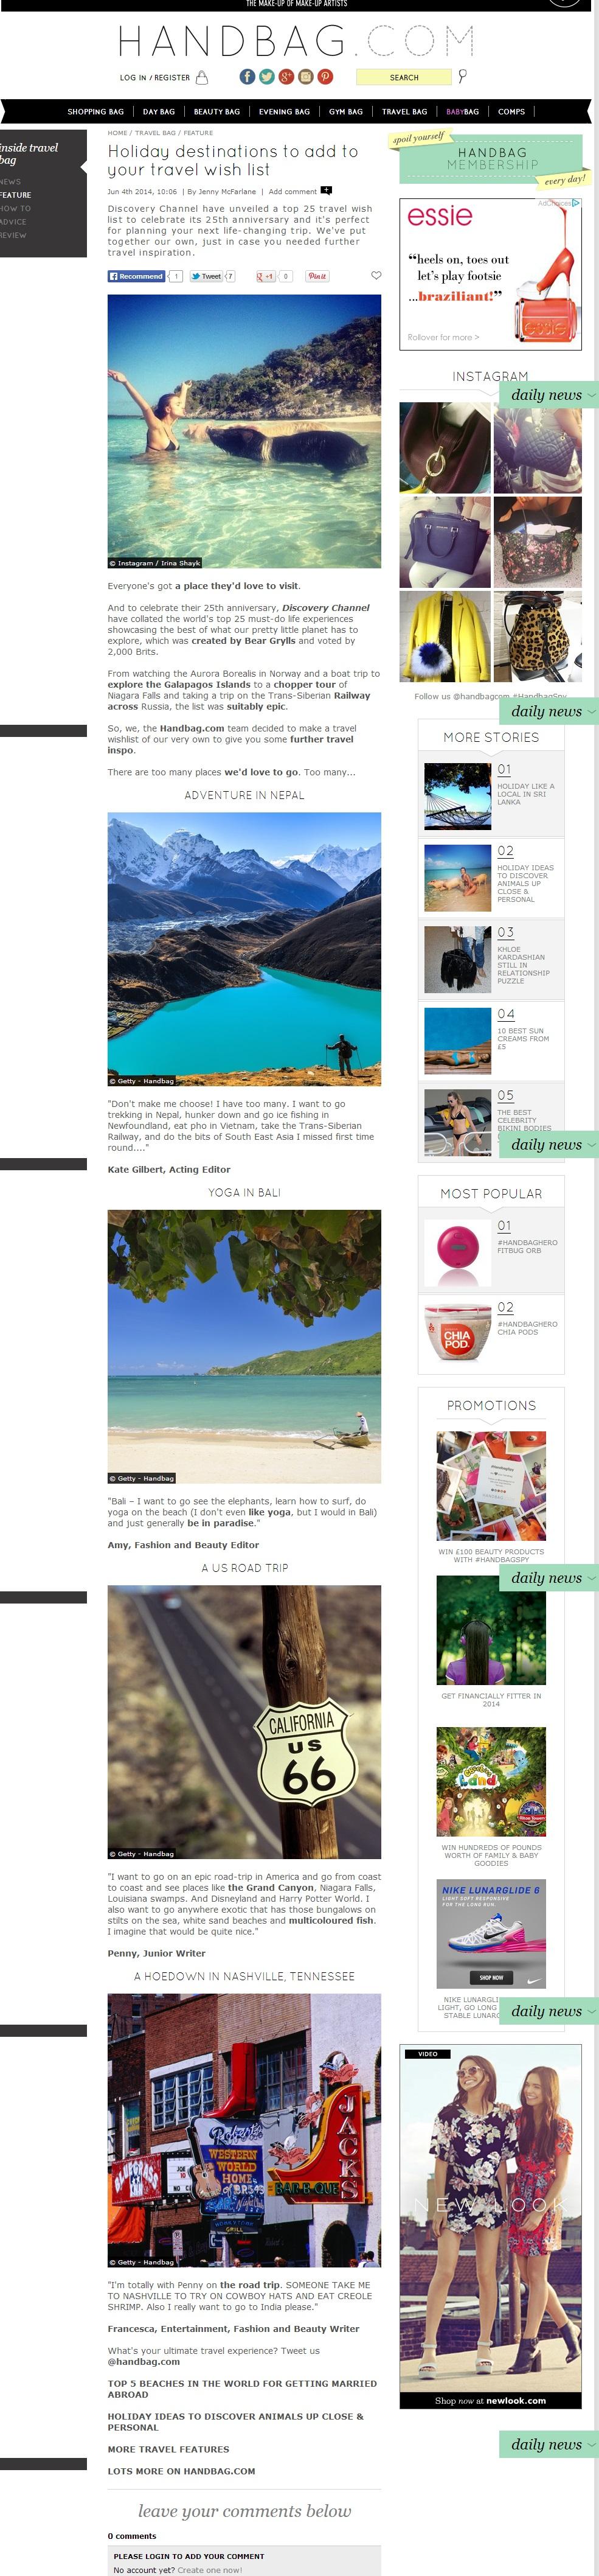 screencapture-www-handbag-com-travel-bag-feature-a571287-holiday-destinations-to-add-to-your-travel-wish-list-html